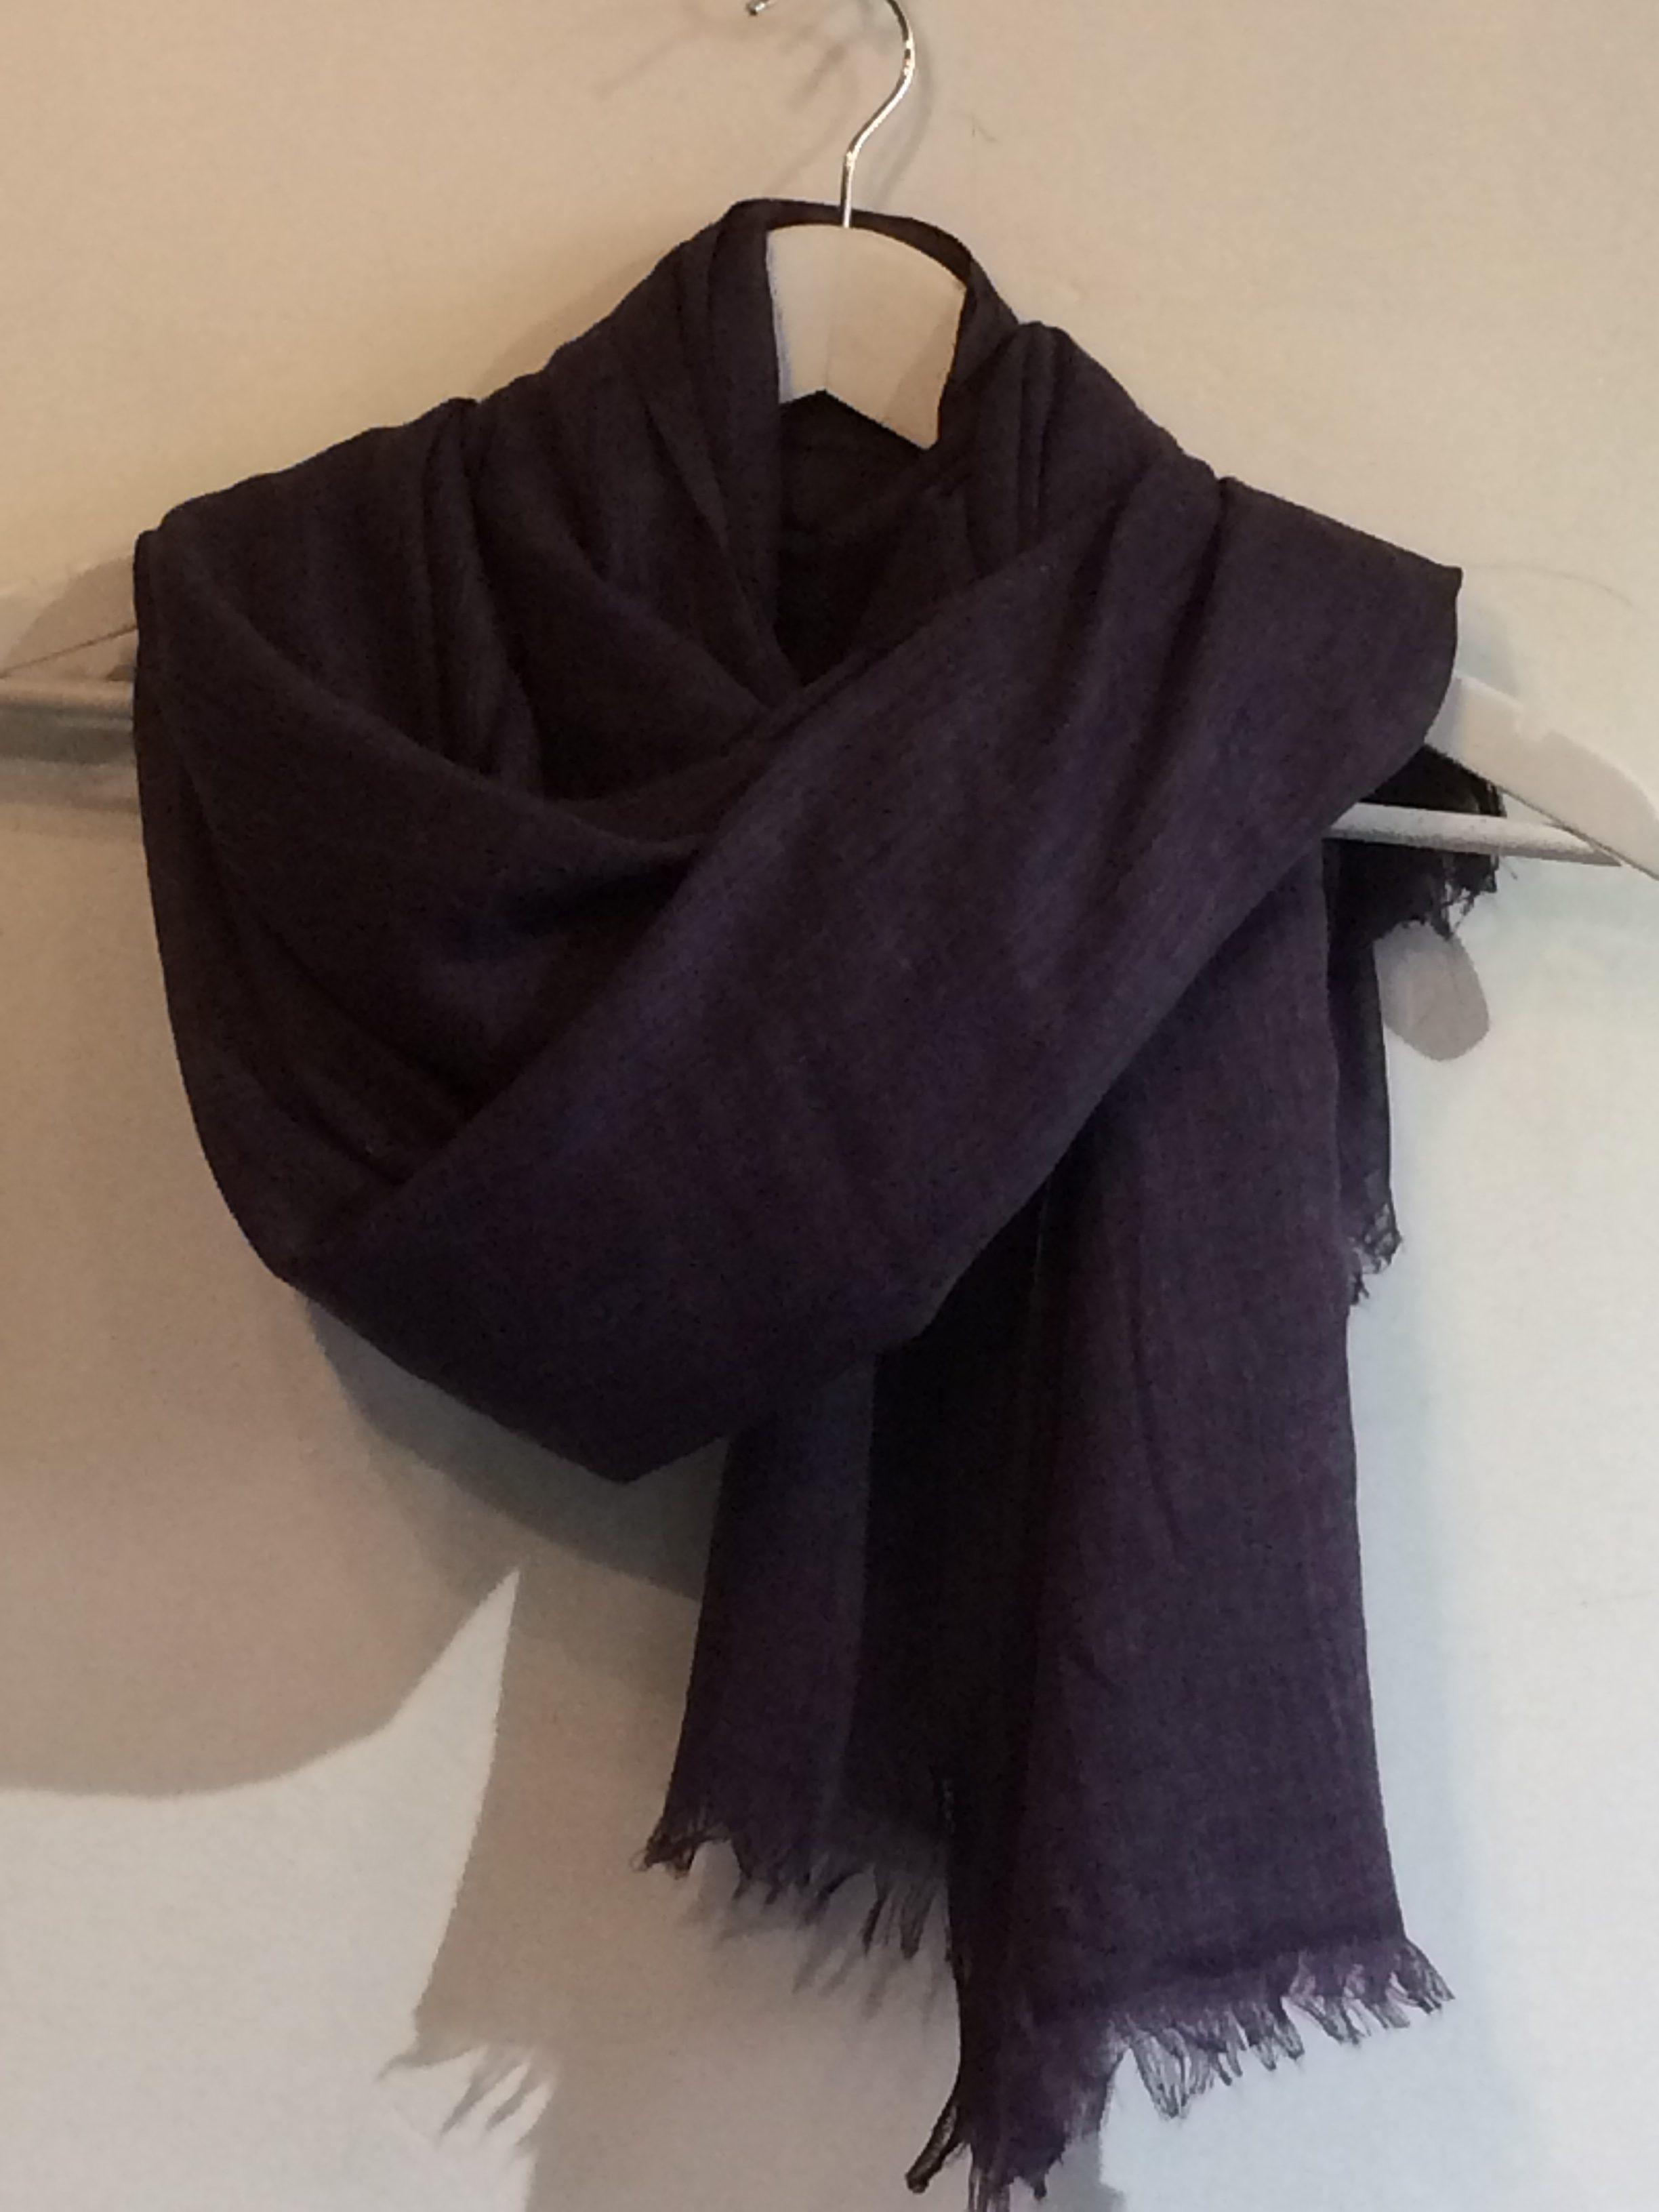 20a60ac806715 Cotton/wool mix plain scarf - dark purple - Jumping Ships UK